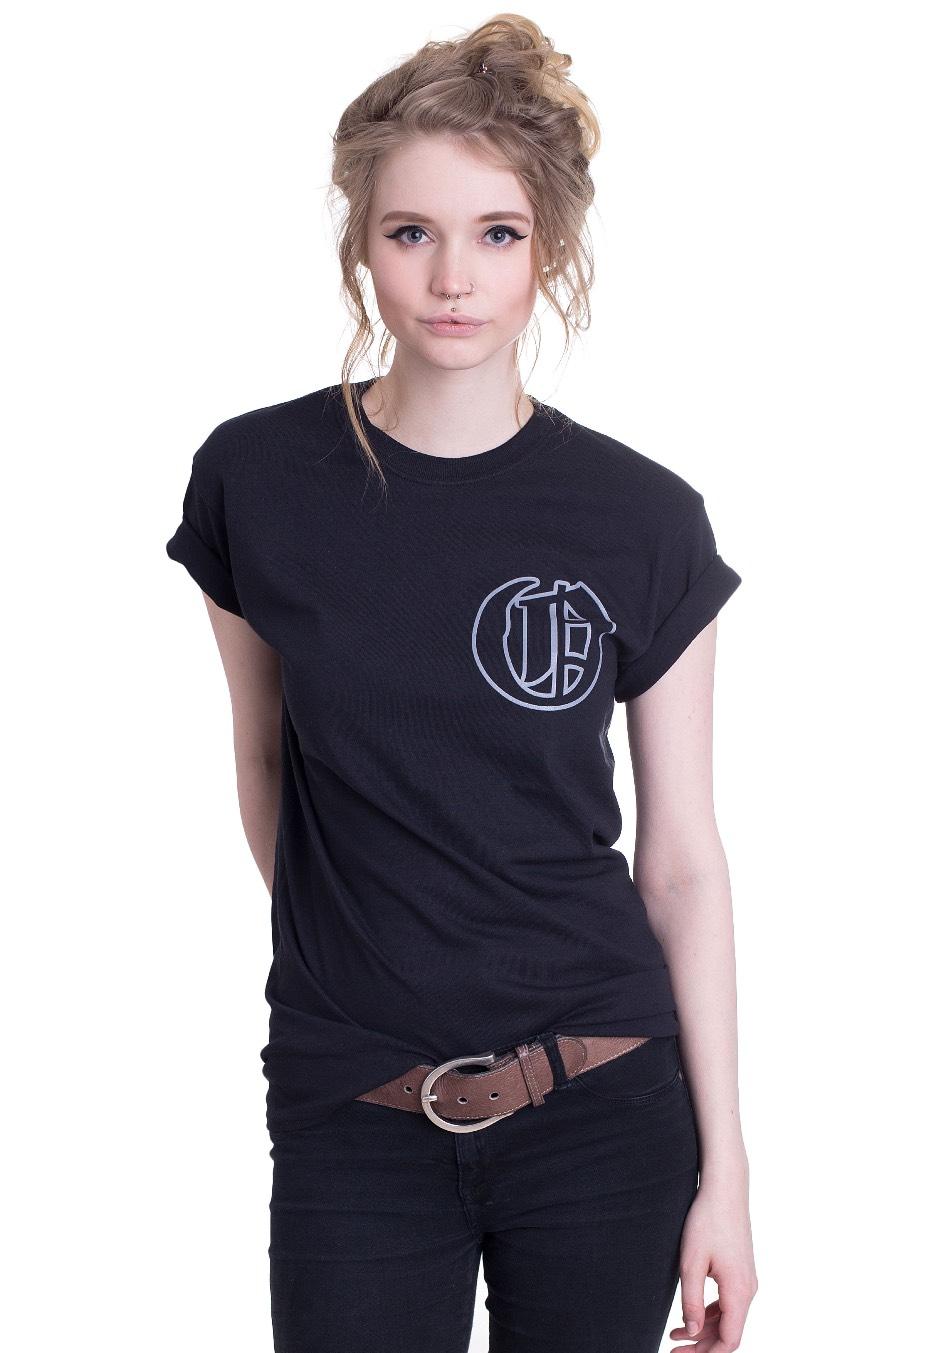 Bad Omens - Dagger - T-Shirt - Official Post Hardcore ...